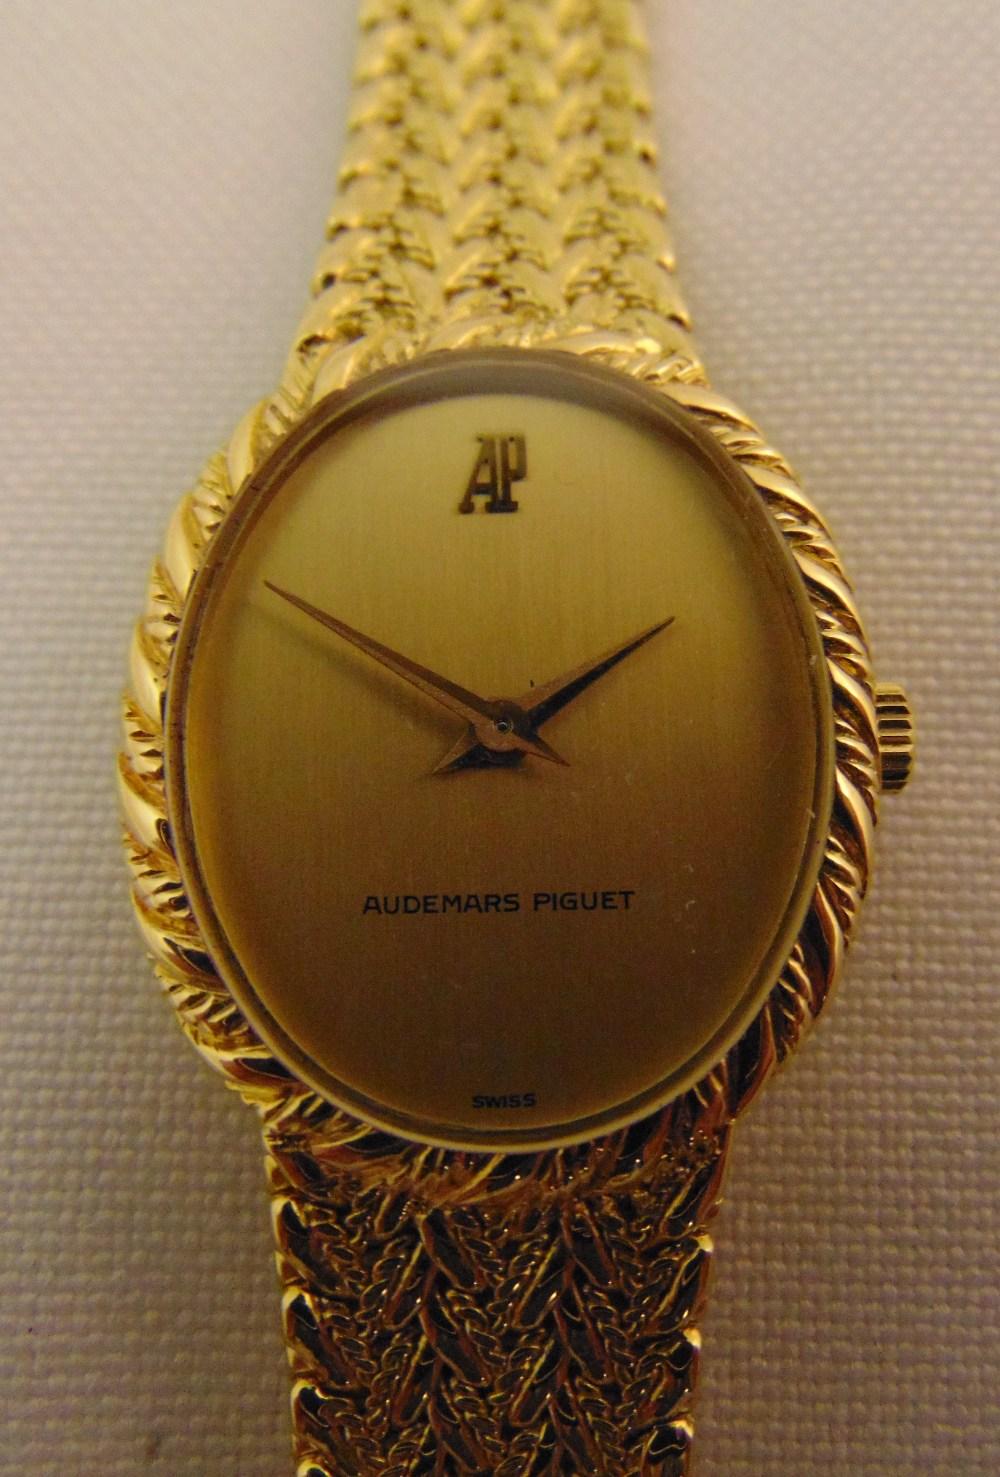 Audermars Piquet 18ct gold ladies wristwatch on integral bracelet, approx total weight 49.9g